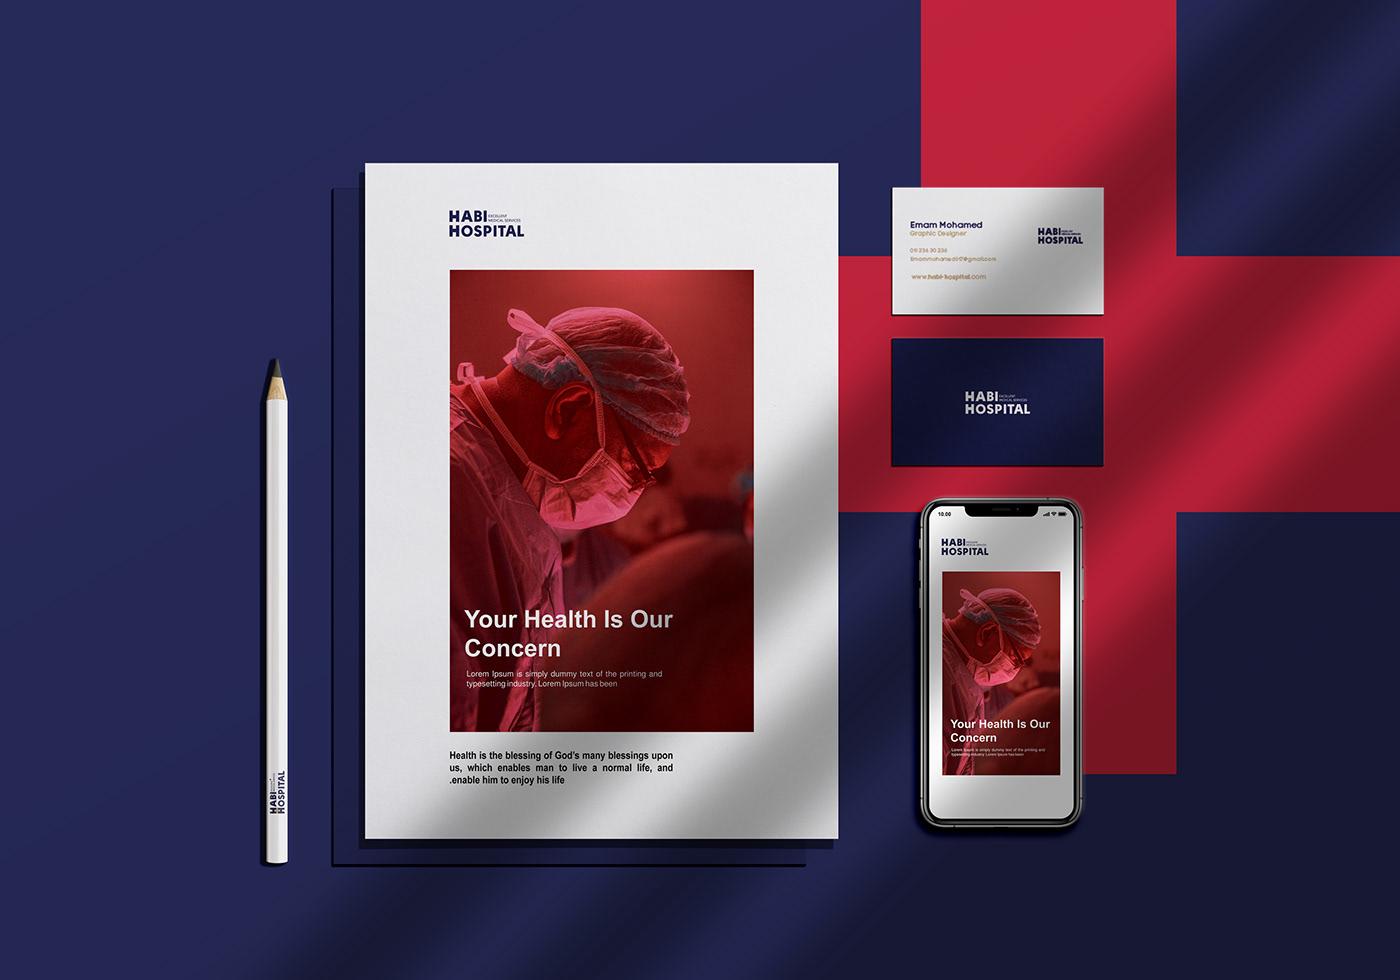 brand care doctor habi hospital logo medical Advertising  Health medicine